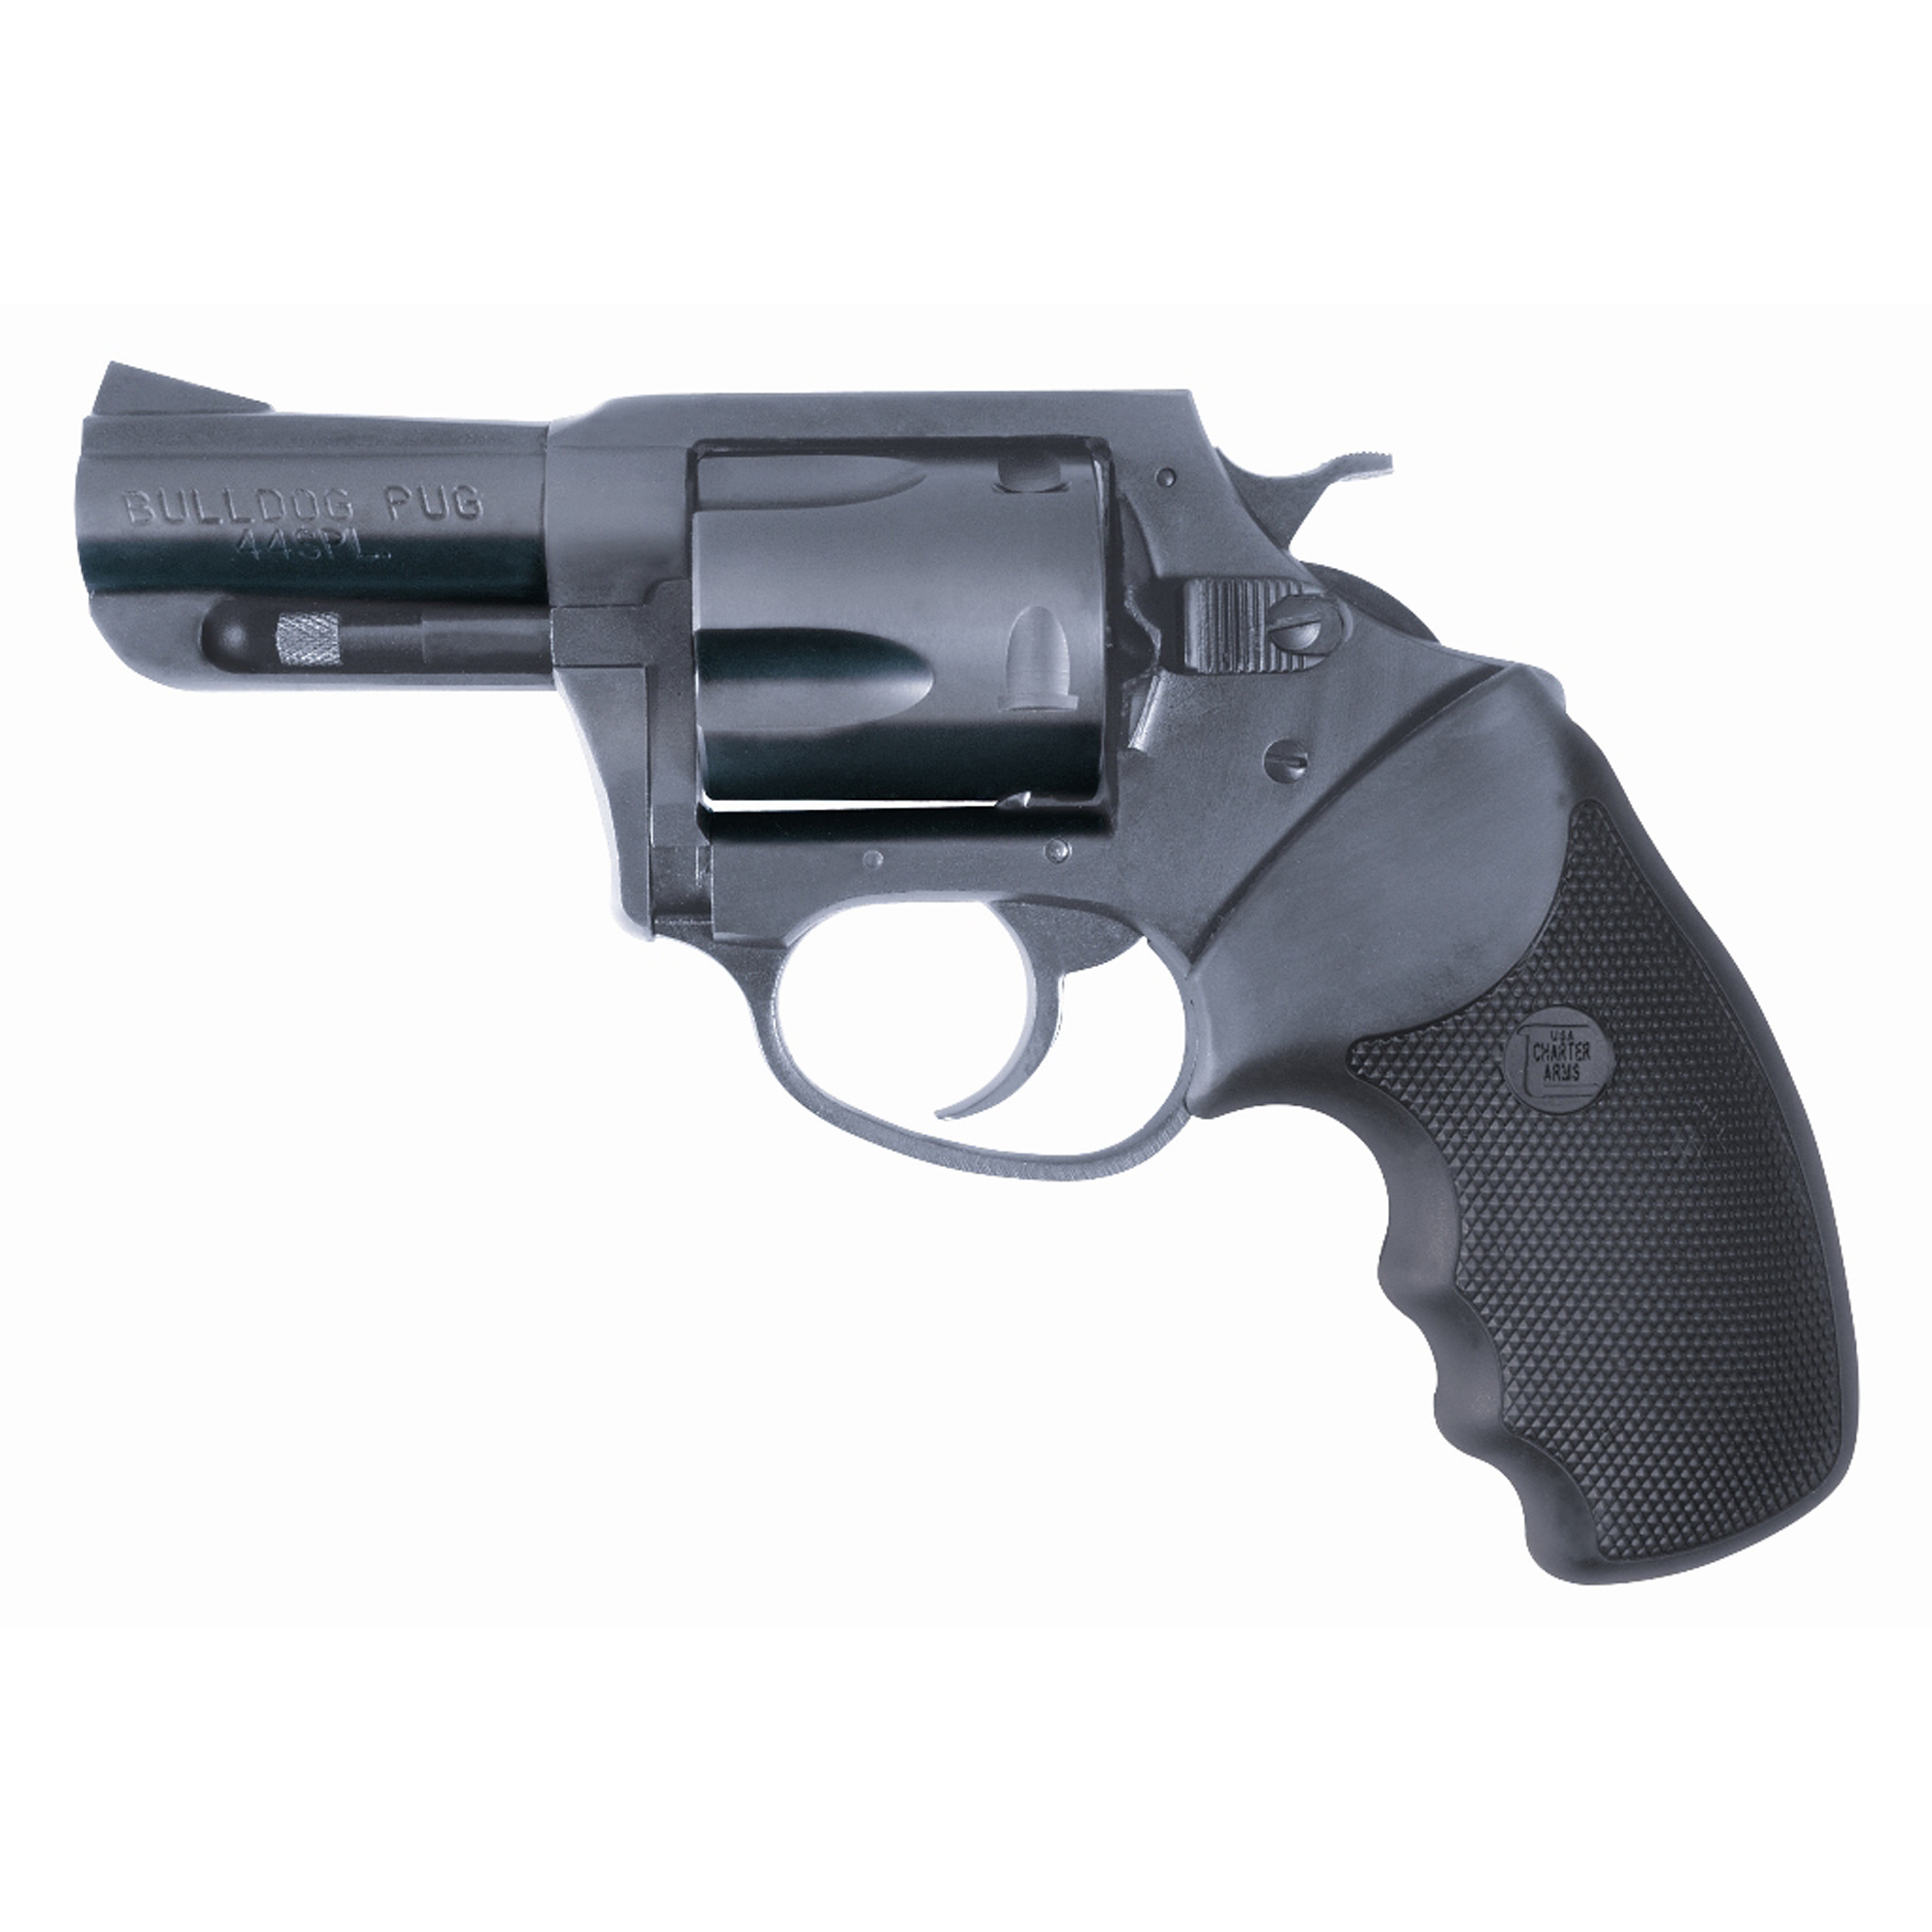 "Charter Arms Bulldog 44spl 2.5"" Bl"